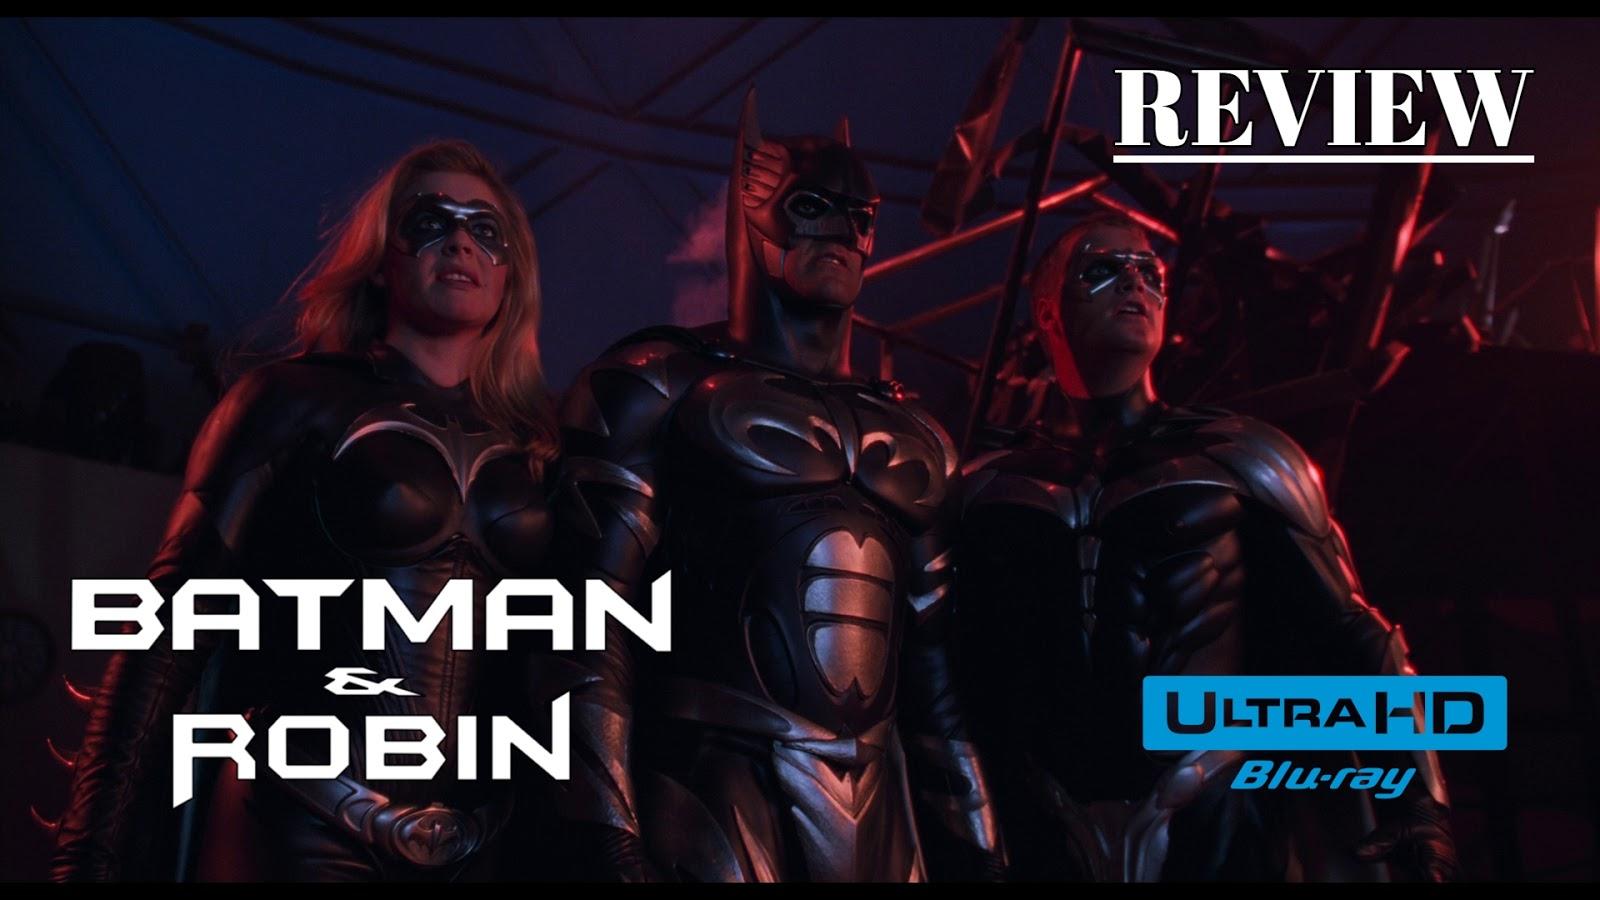 Batman Robin 1997 4k Ultra Hd Blu Ray Review The Basics